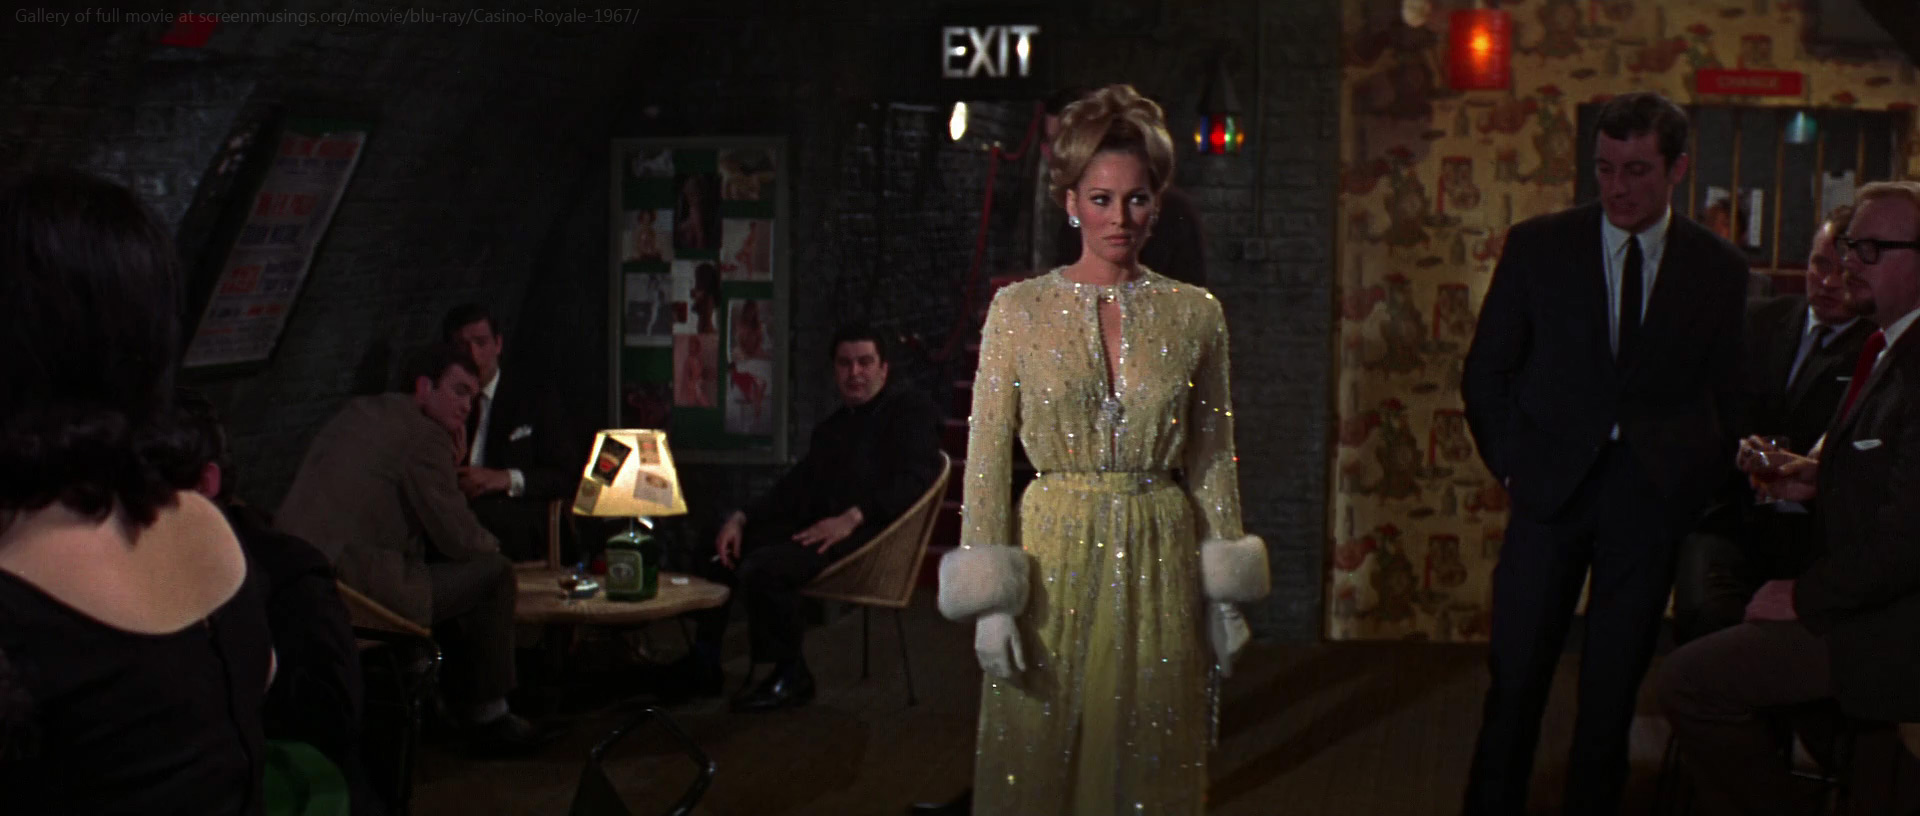 Cast casino royale 1967